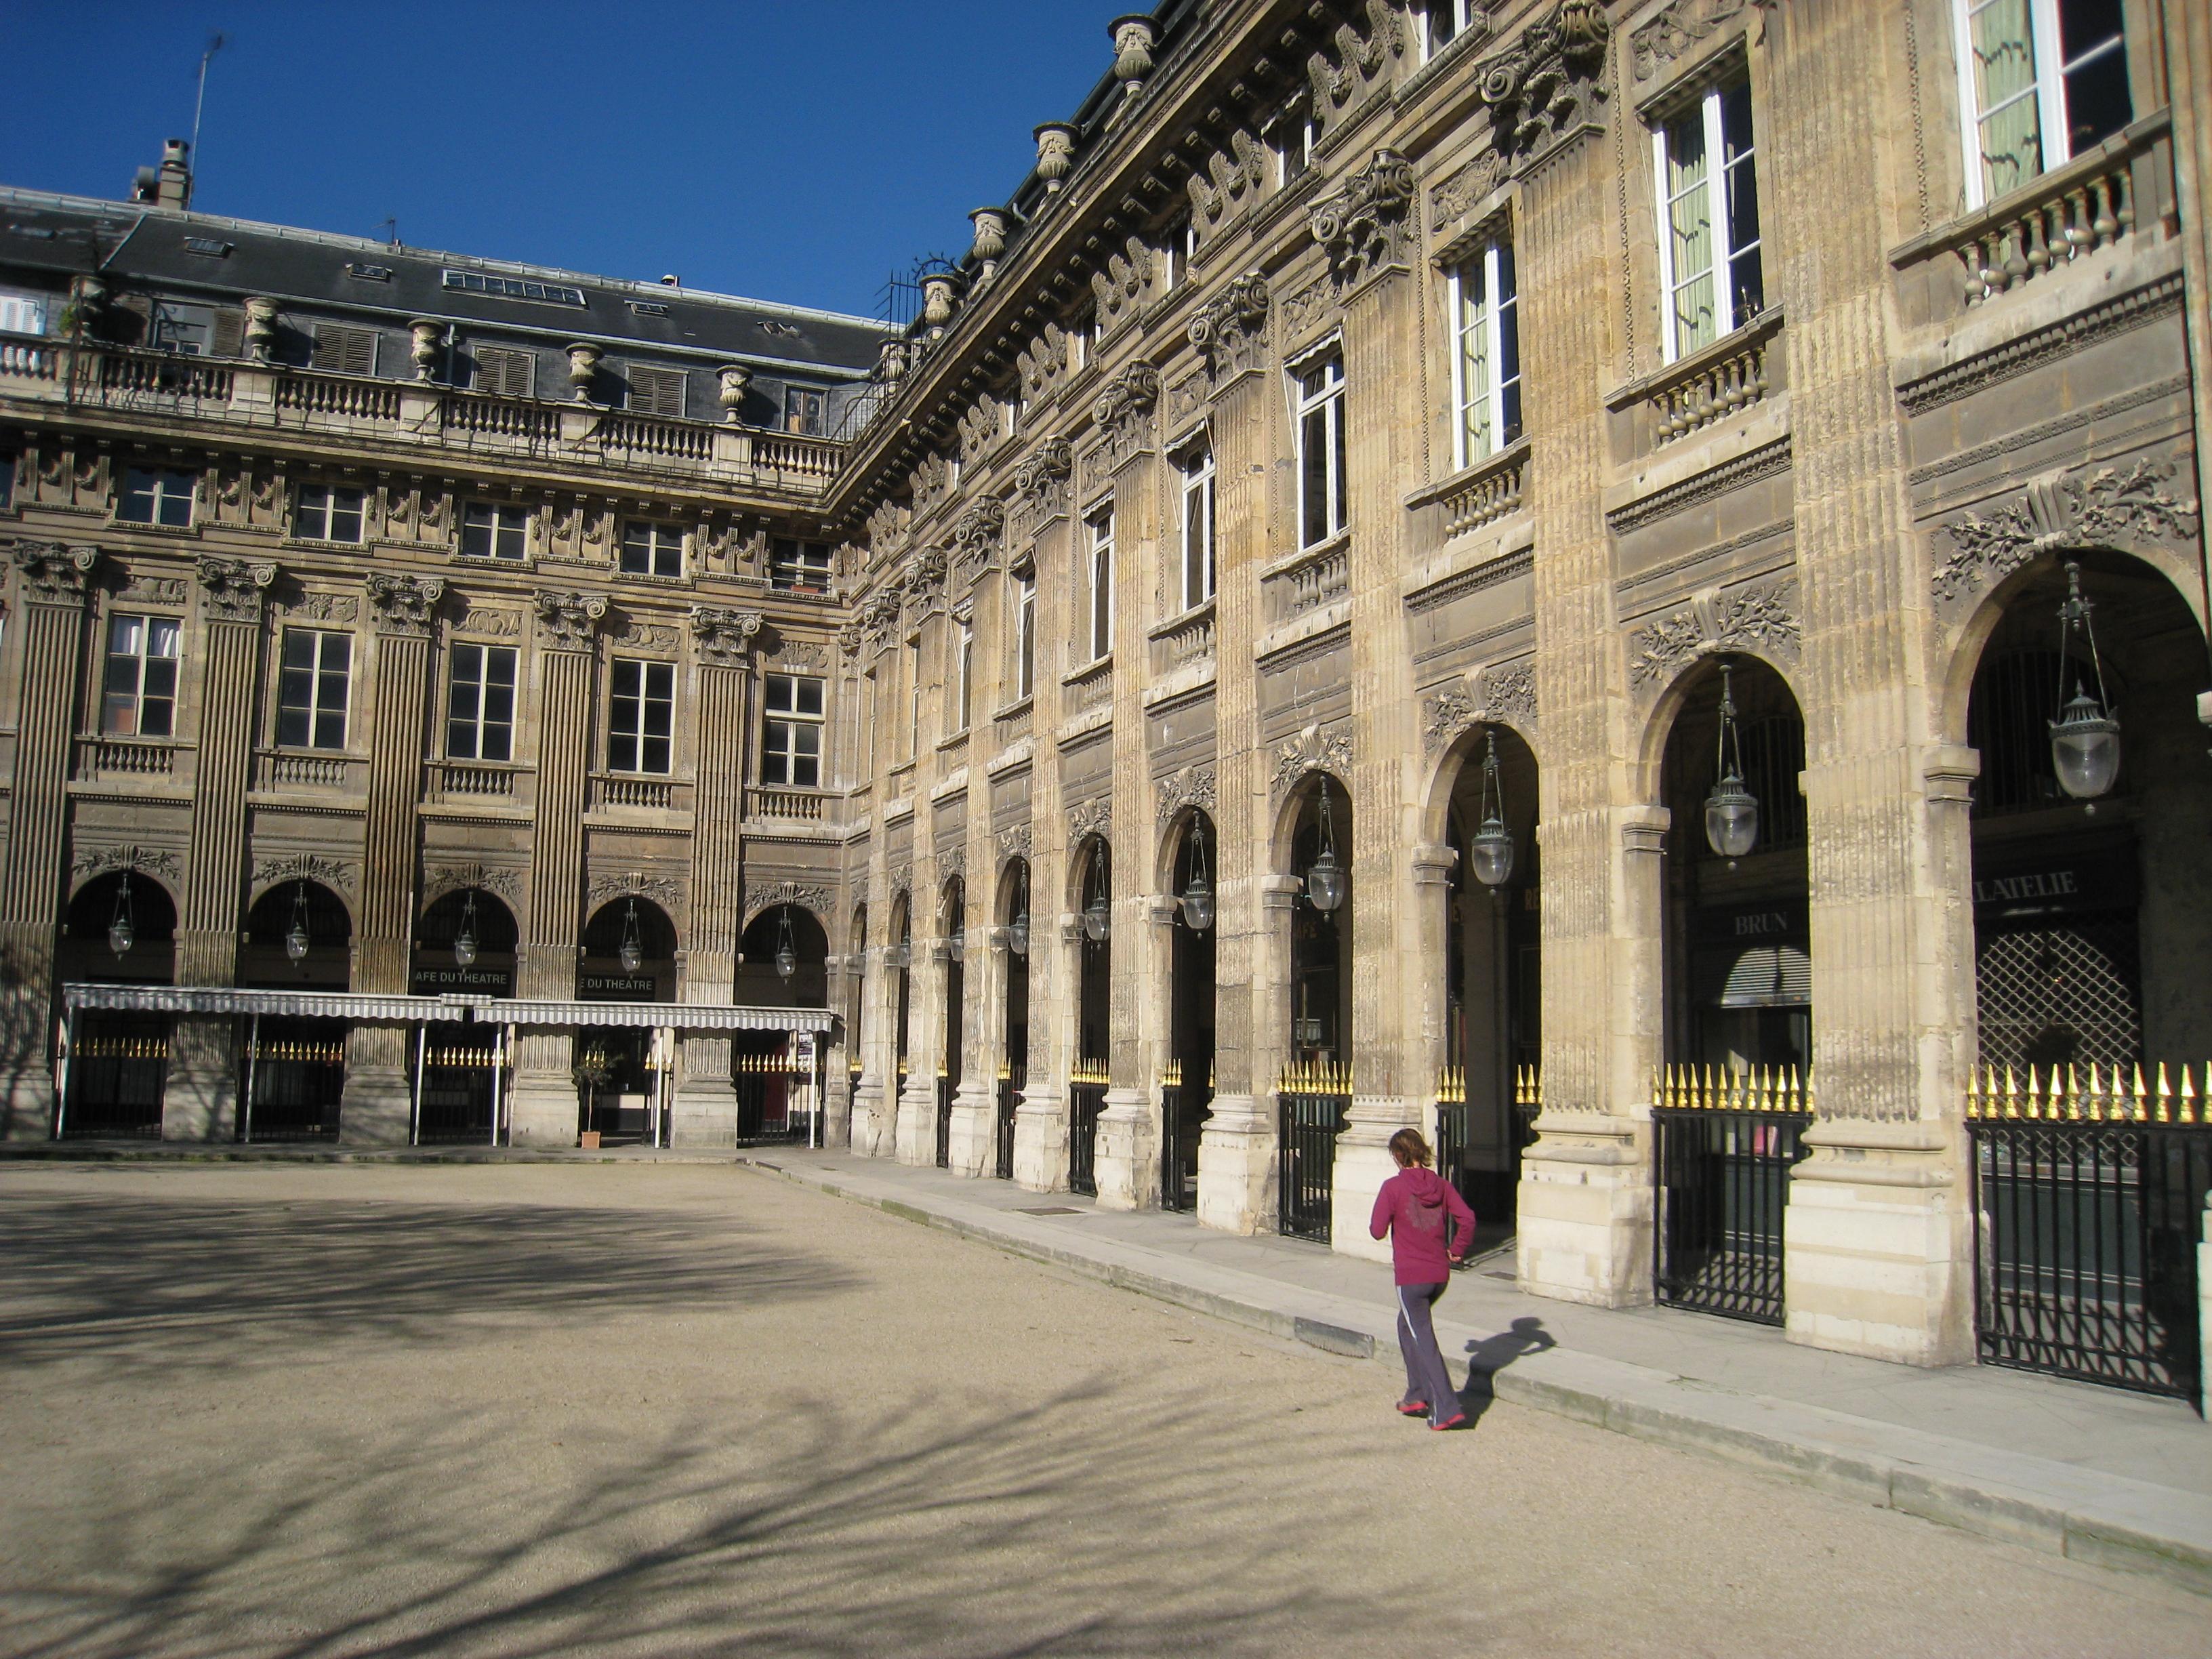 Palais_Royal,_Paris_-_interior_courtyard_detail wiki commons